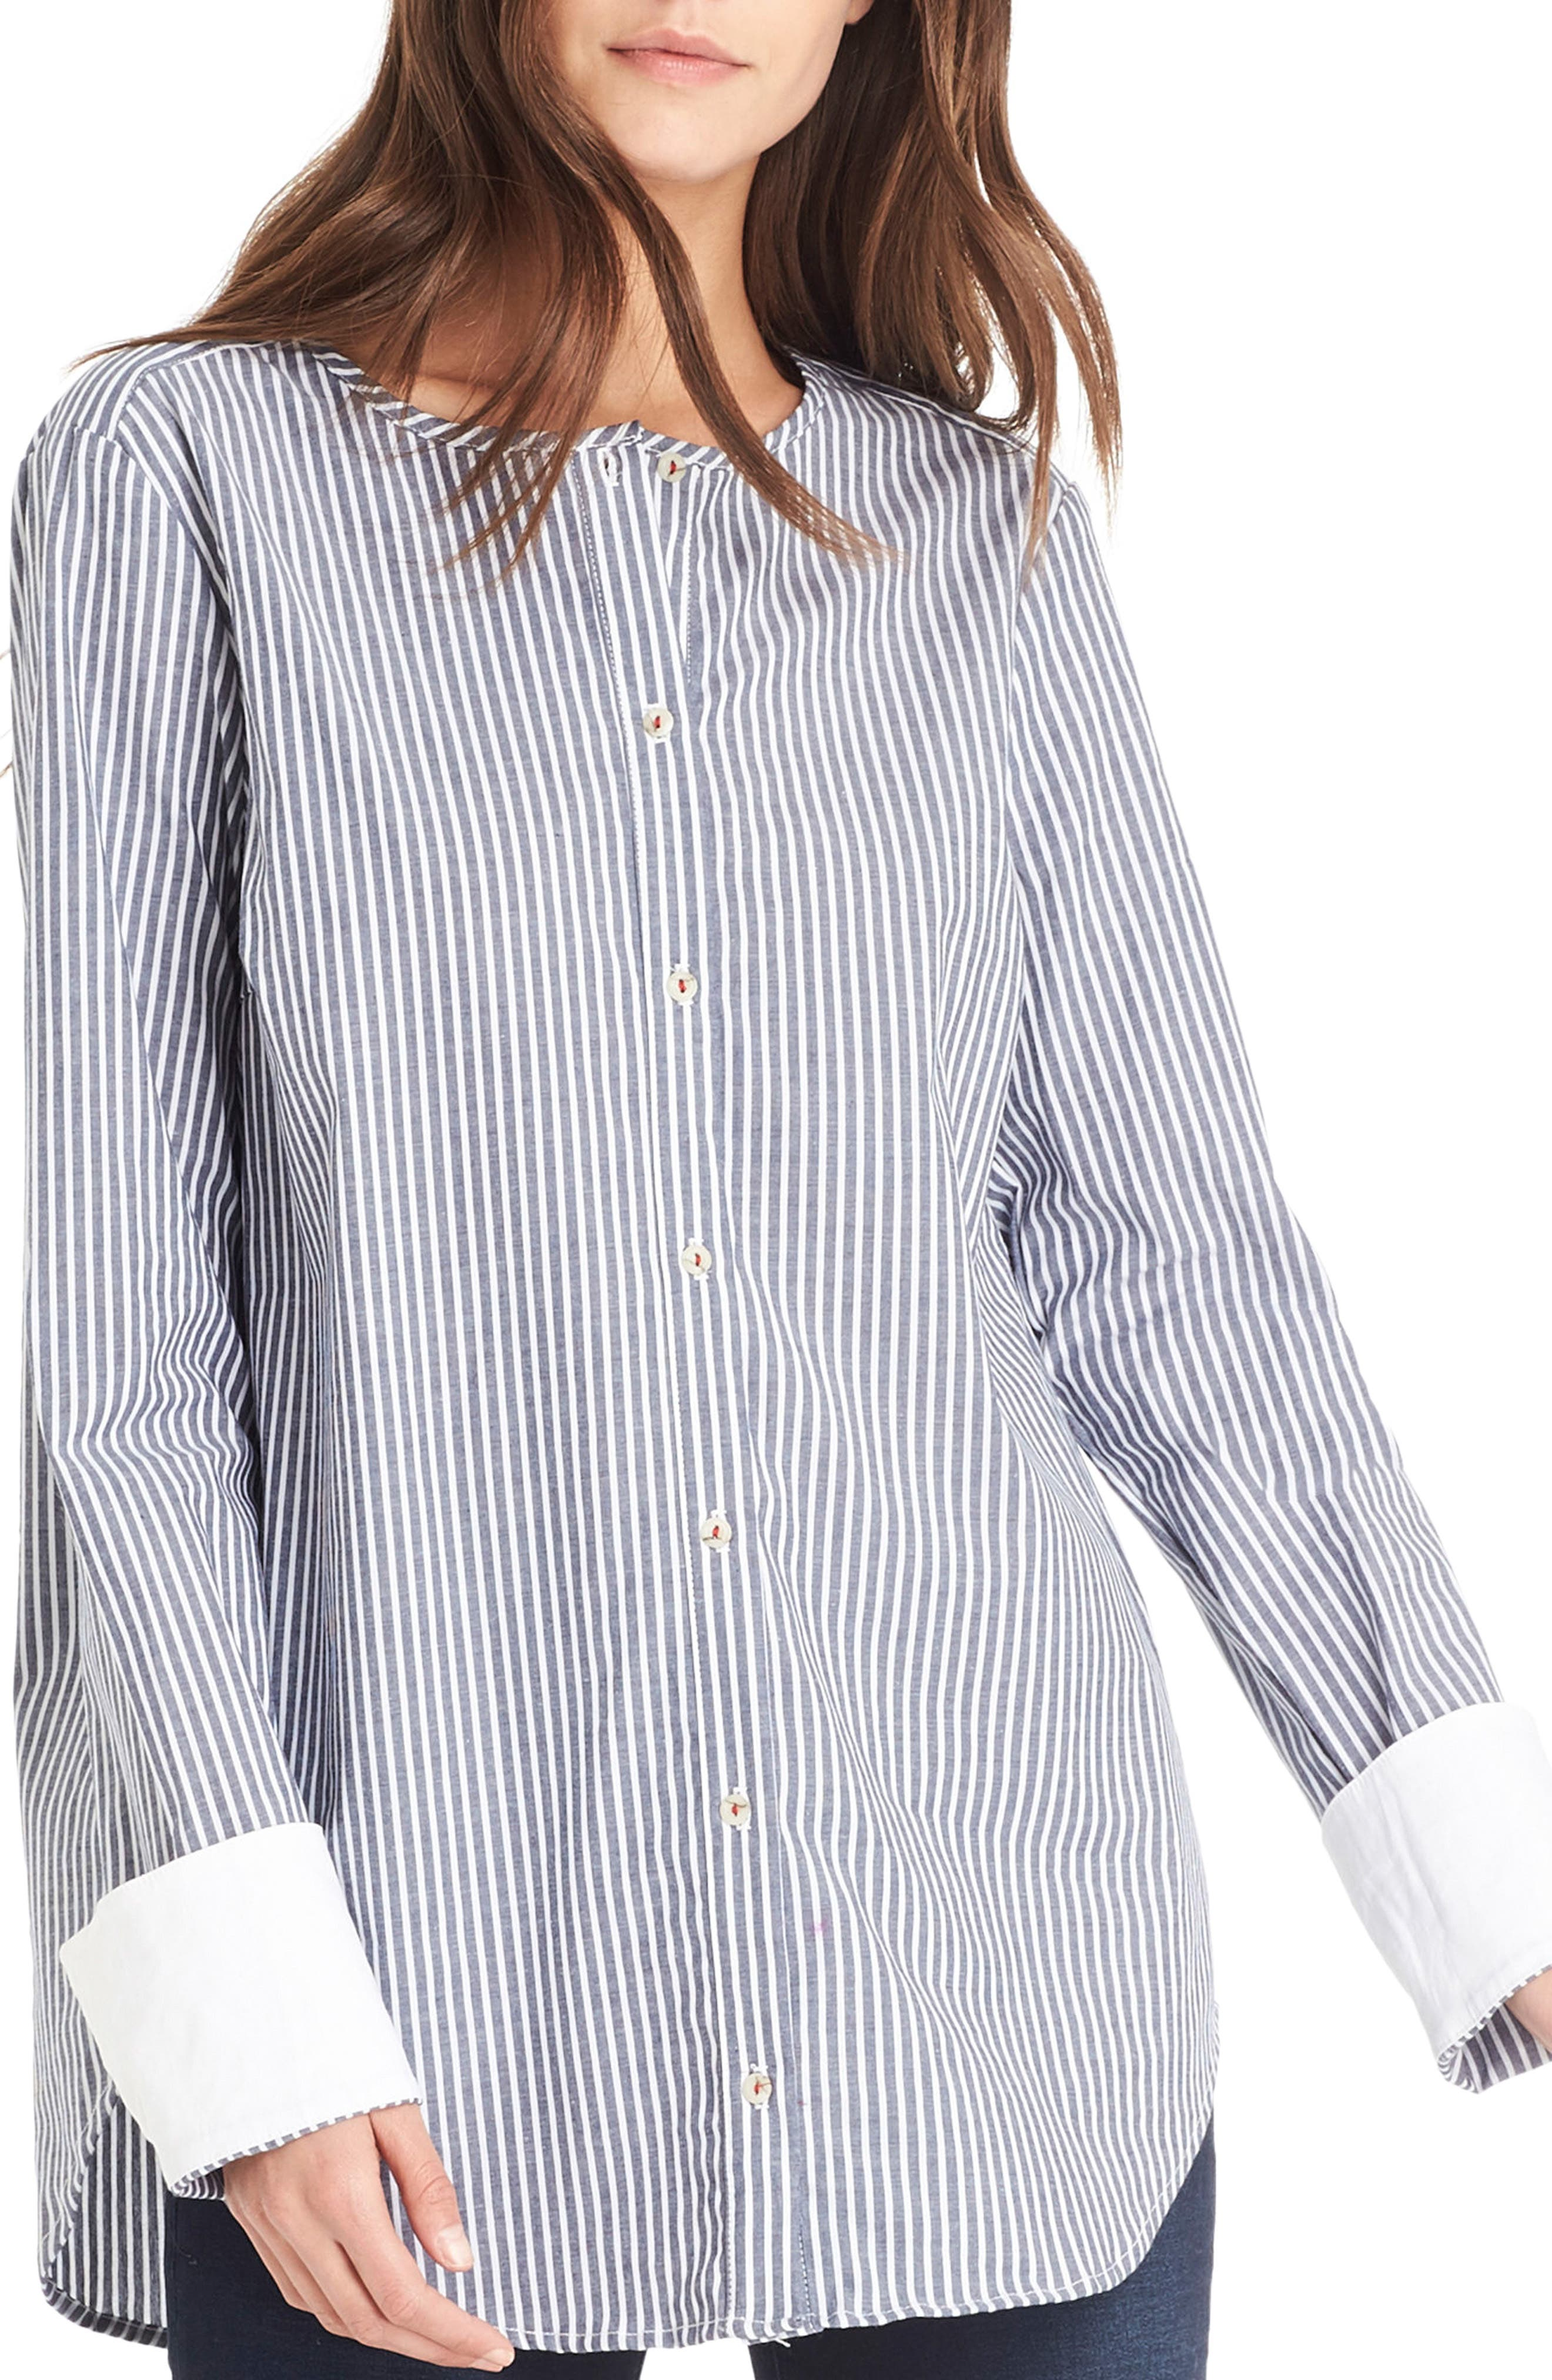 MICHAEL STARS Contrast Cuff Shirt